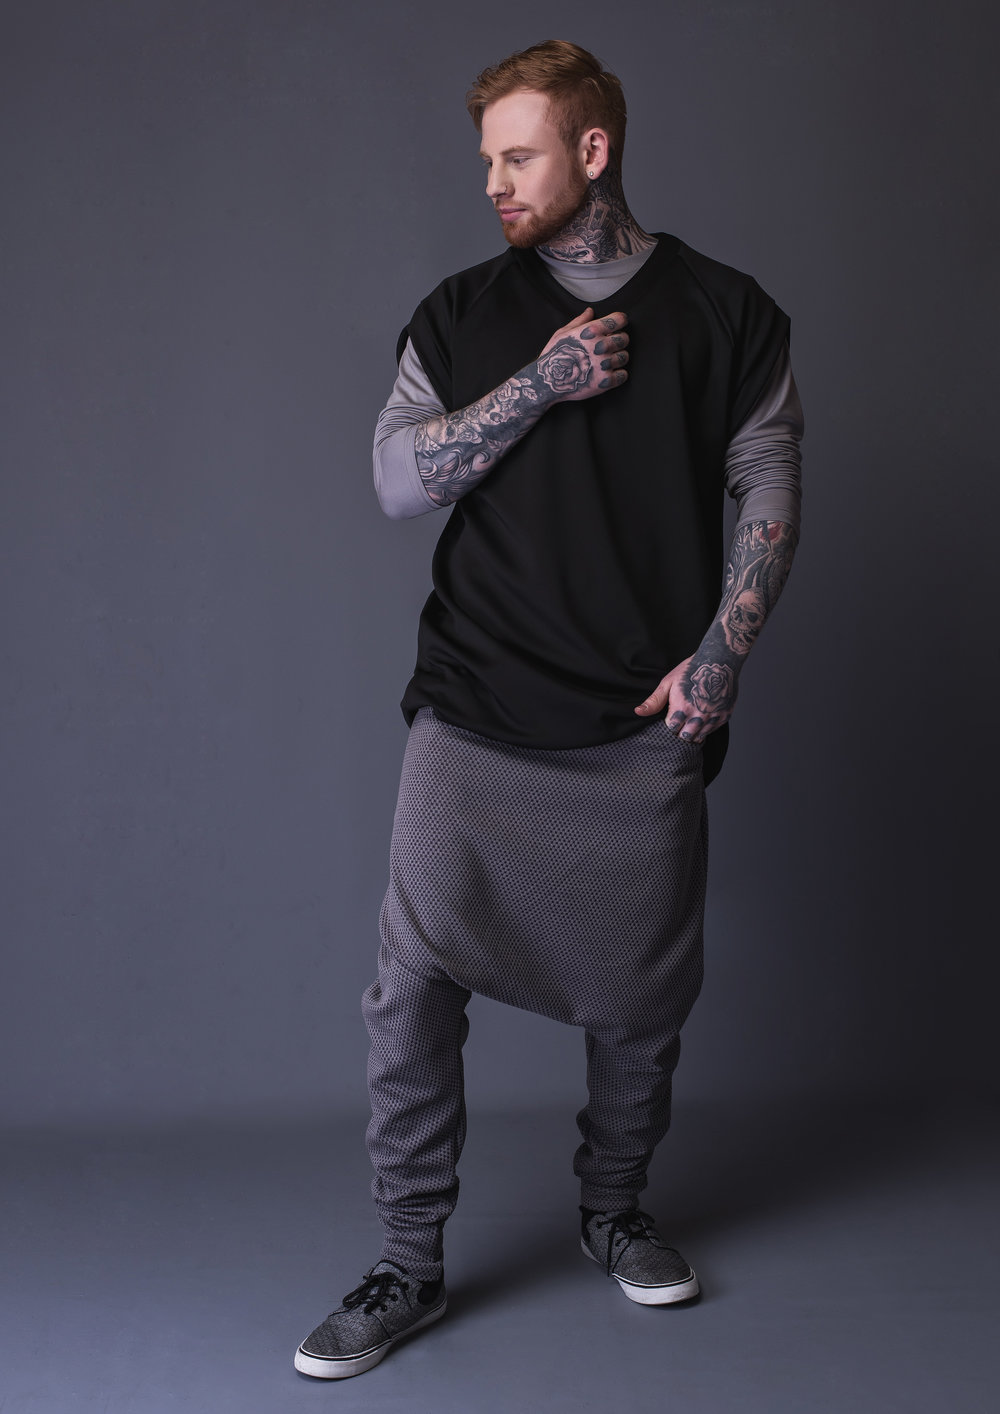 zaramia-ava-zaramiaava-leeds-fashion-designer-leedsfashiondesigner-stylist-leeds-stylist-leedsstylist-ethical-sustainable-minimalist-versatile-drape-kobe-nishi-hiroto-hareem-trouser-pants-10